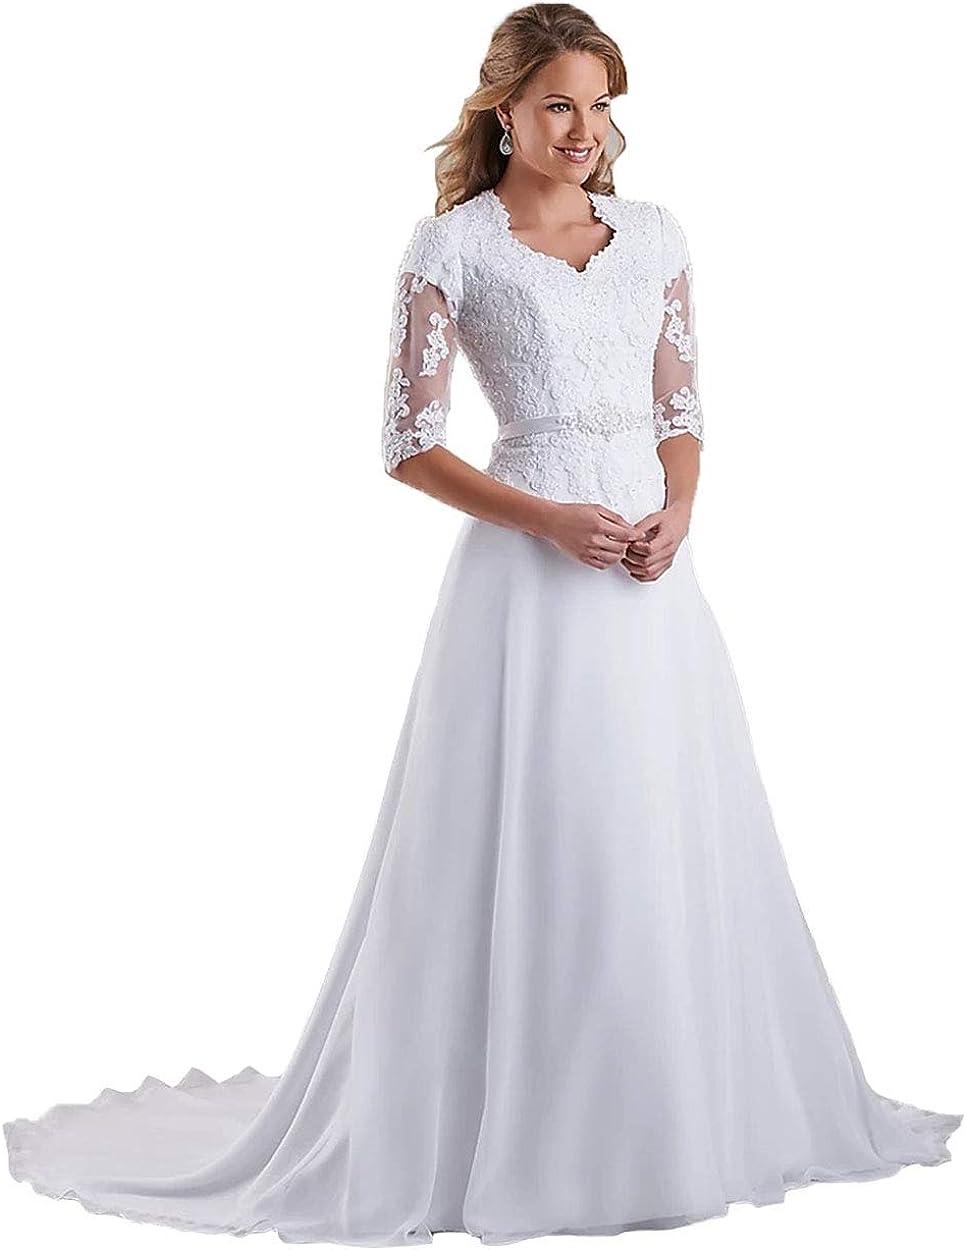 Miao Duo Women's 蔵 Elegant Lace Beach Wedding Dresses for Bride 20 発売モデル